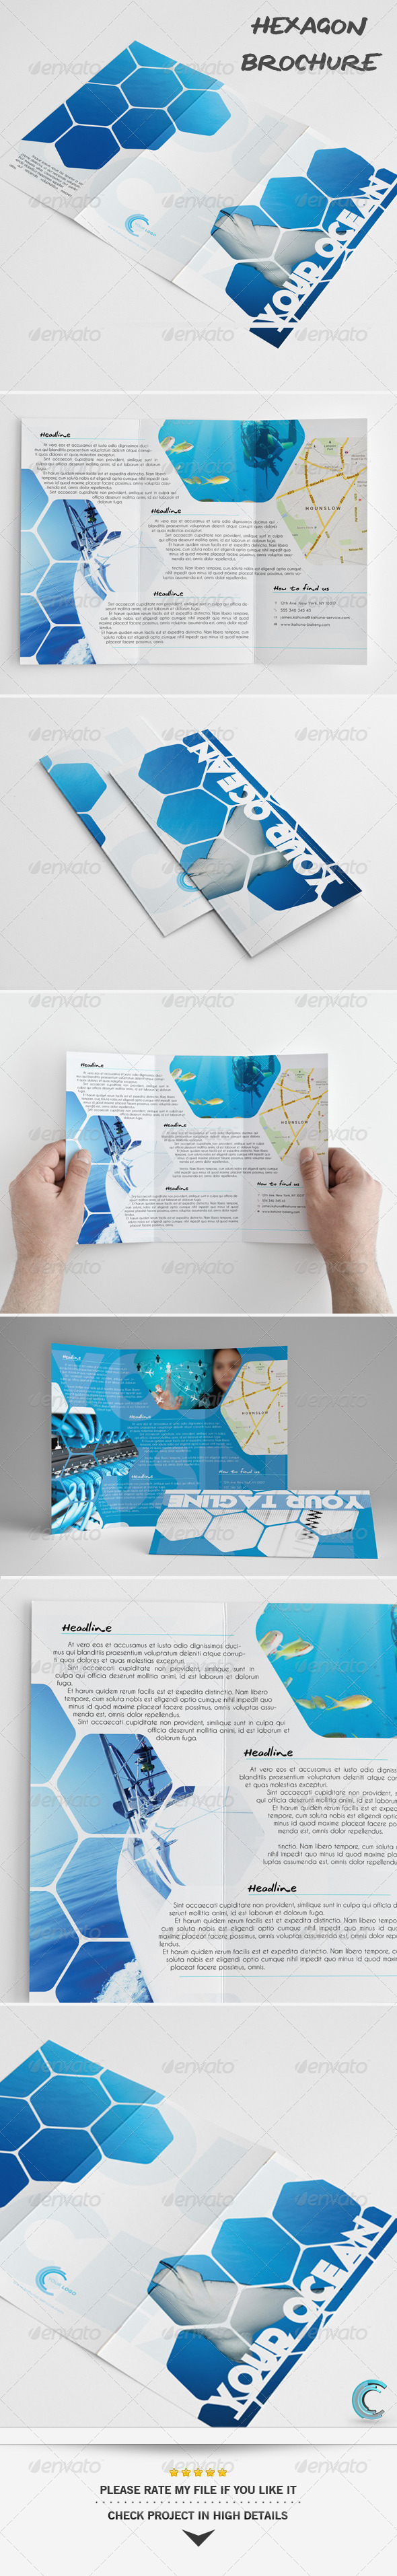 GraphicRiver Hexagon Universal Brochure 5921424